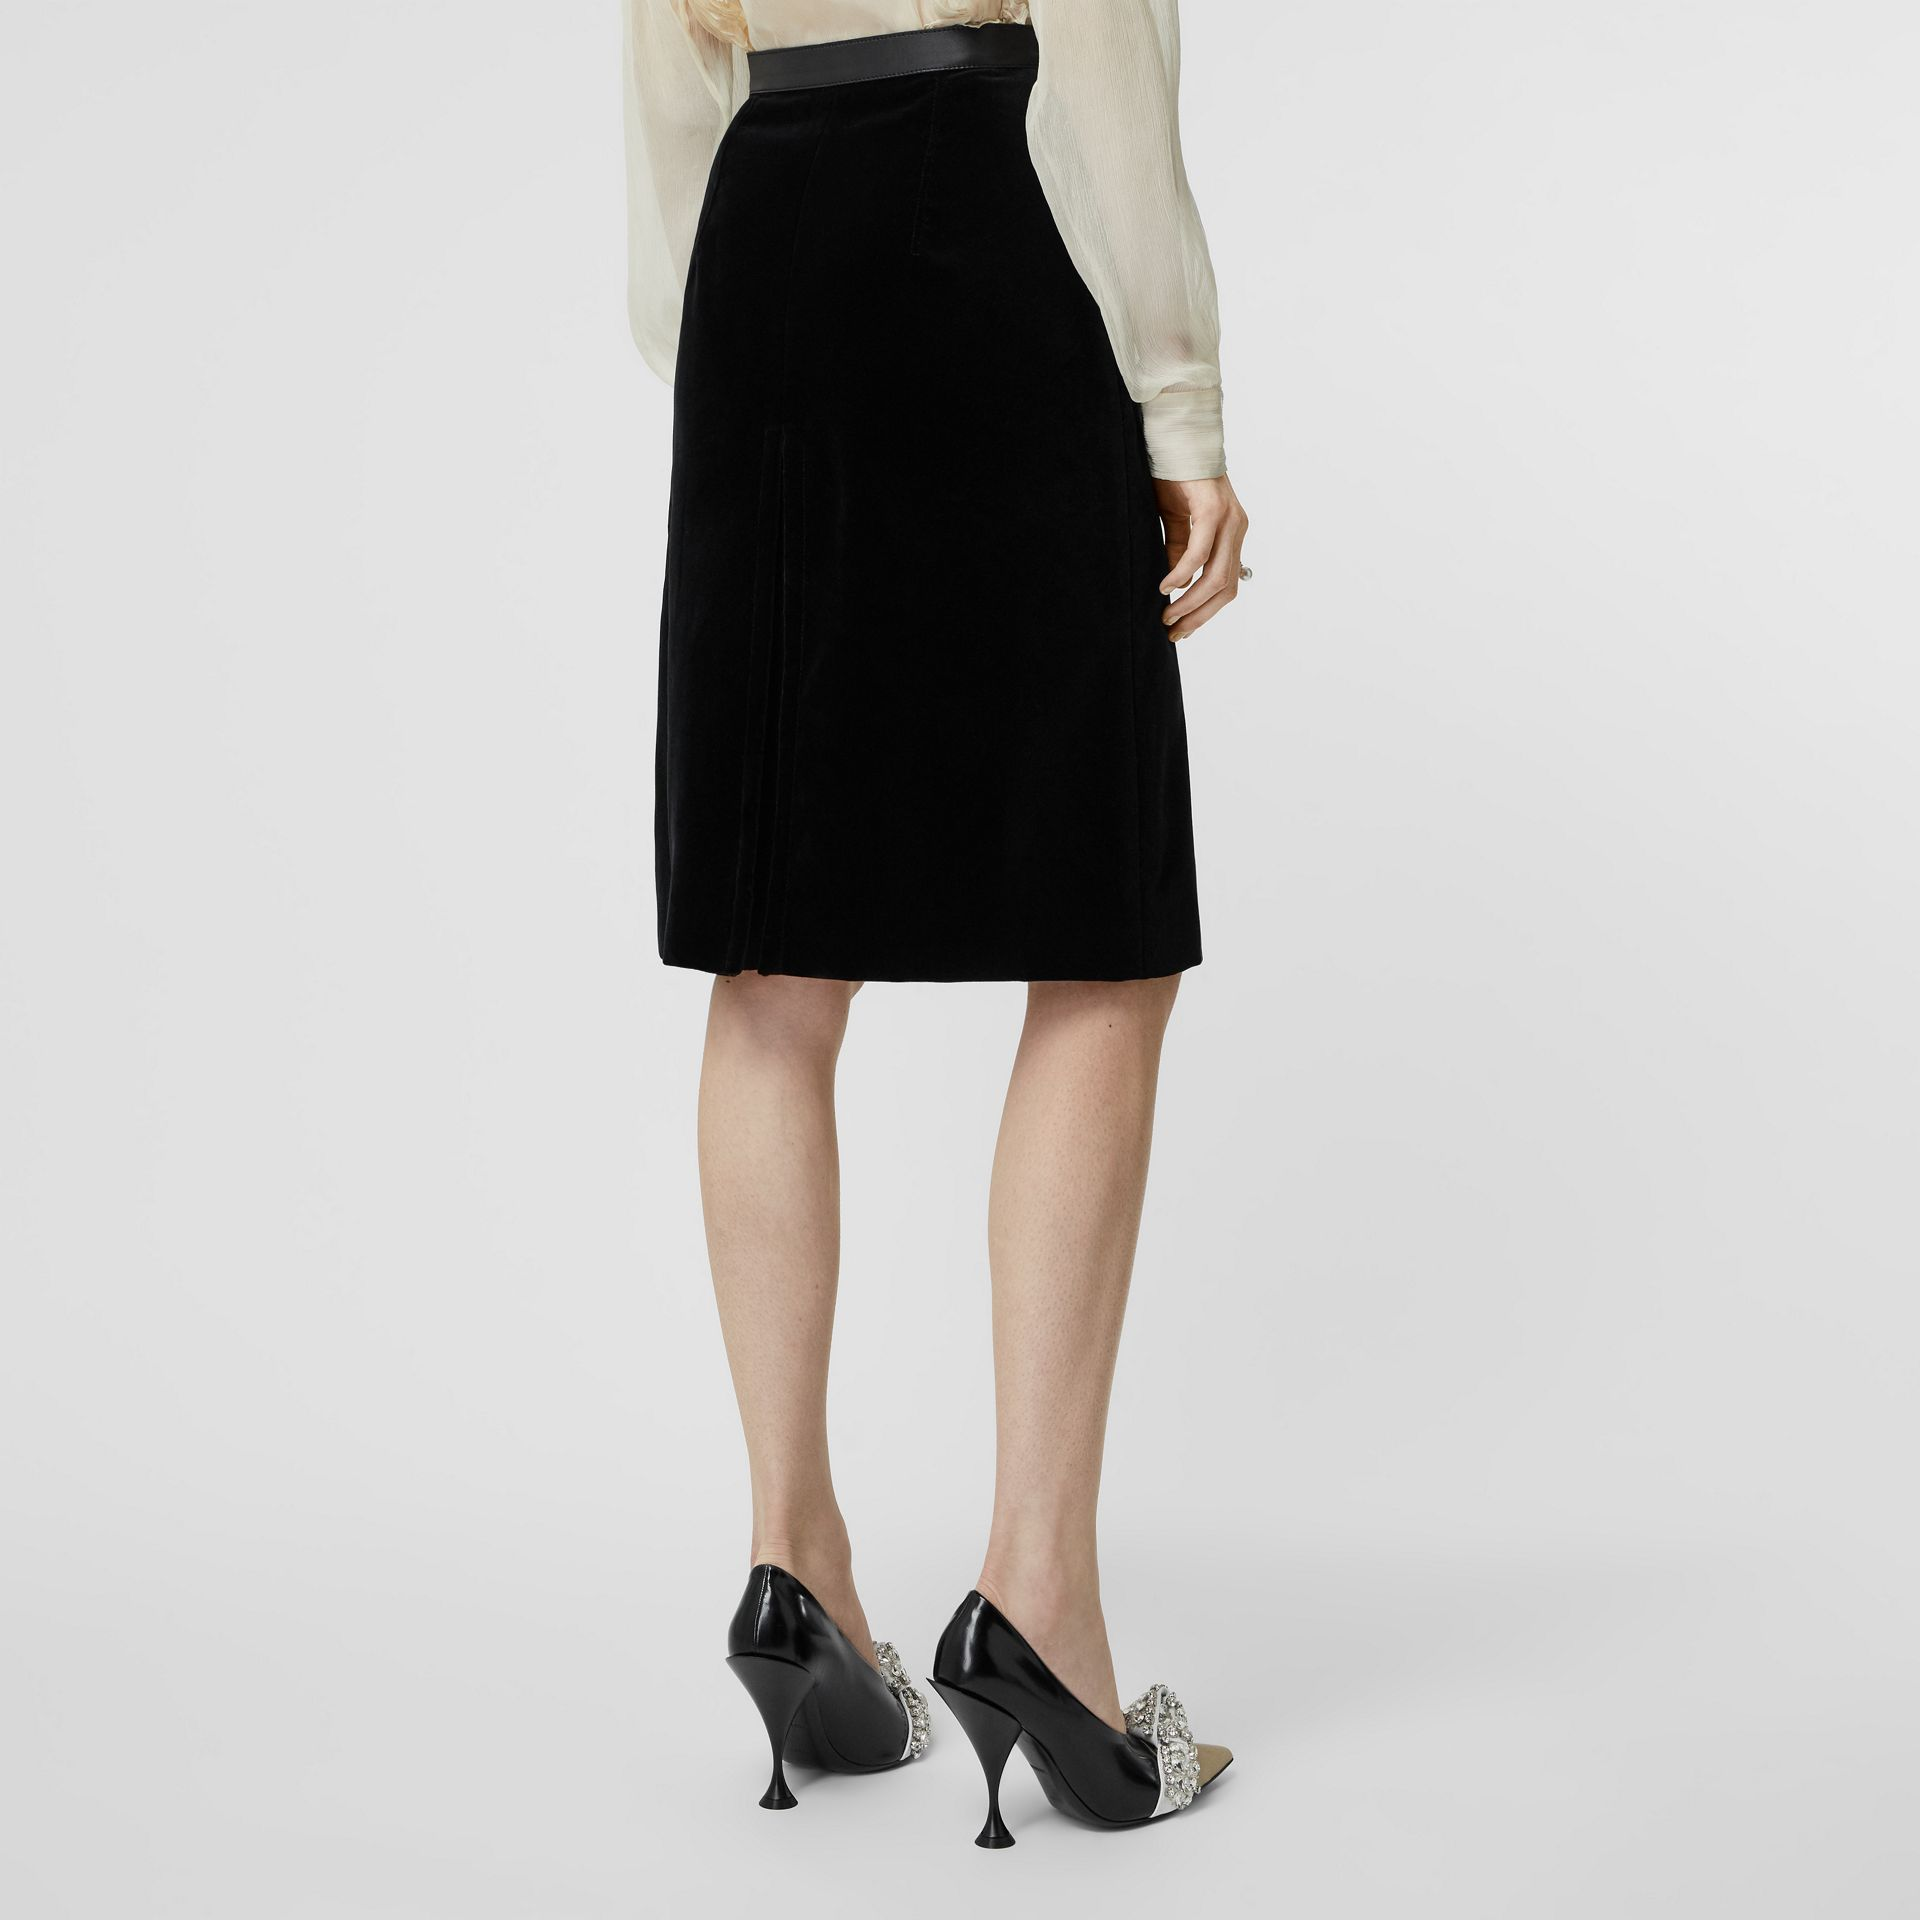 Lambskin Trim Box Pleat Detail Velvet and Wool Skirt in Black - Women | Burberry - gallery image 2